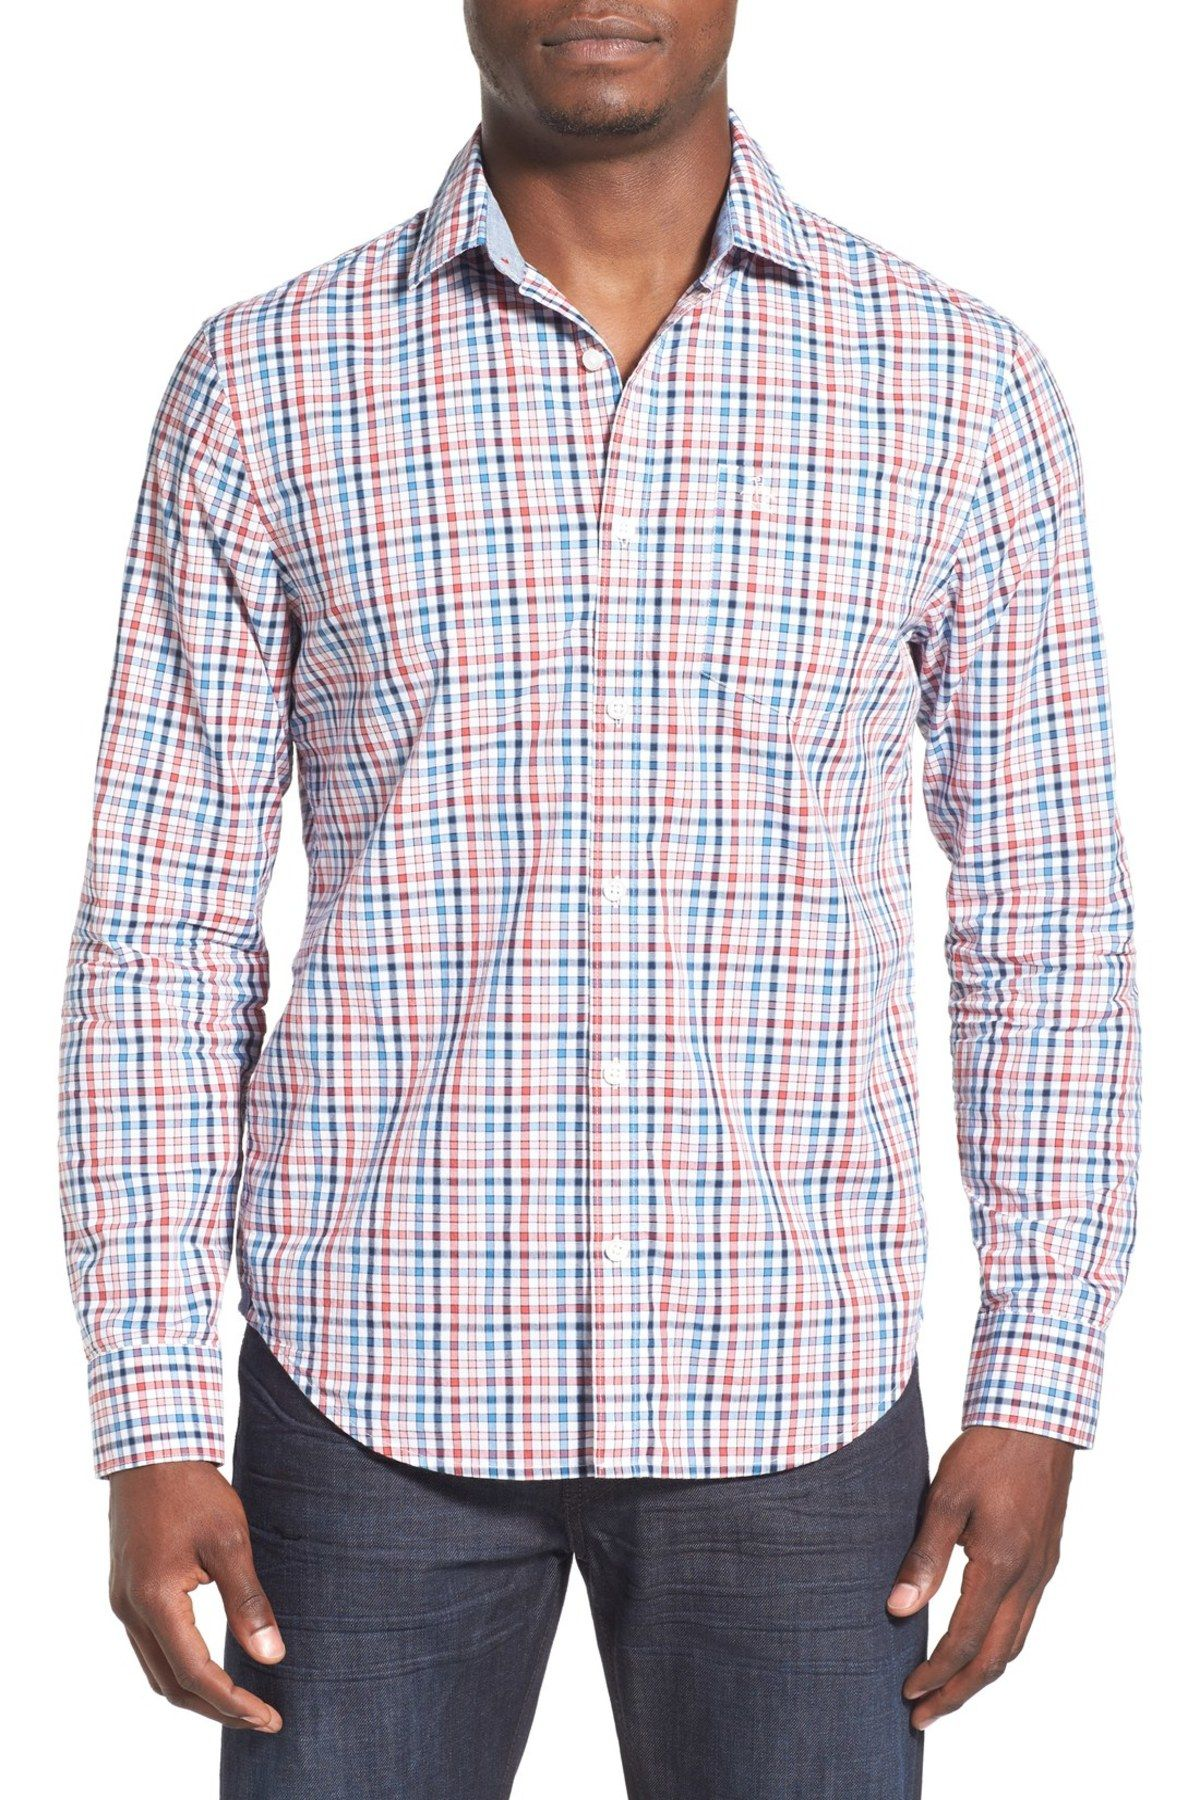 P55 Check Woven Long Sleeve Trim Fit Shirt